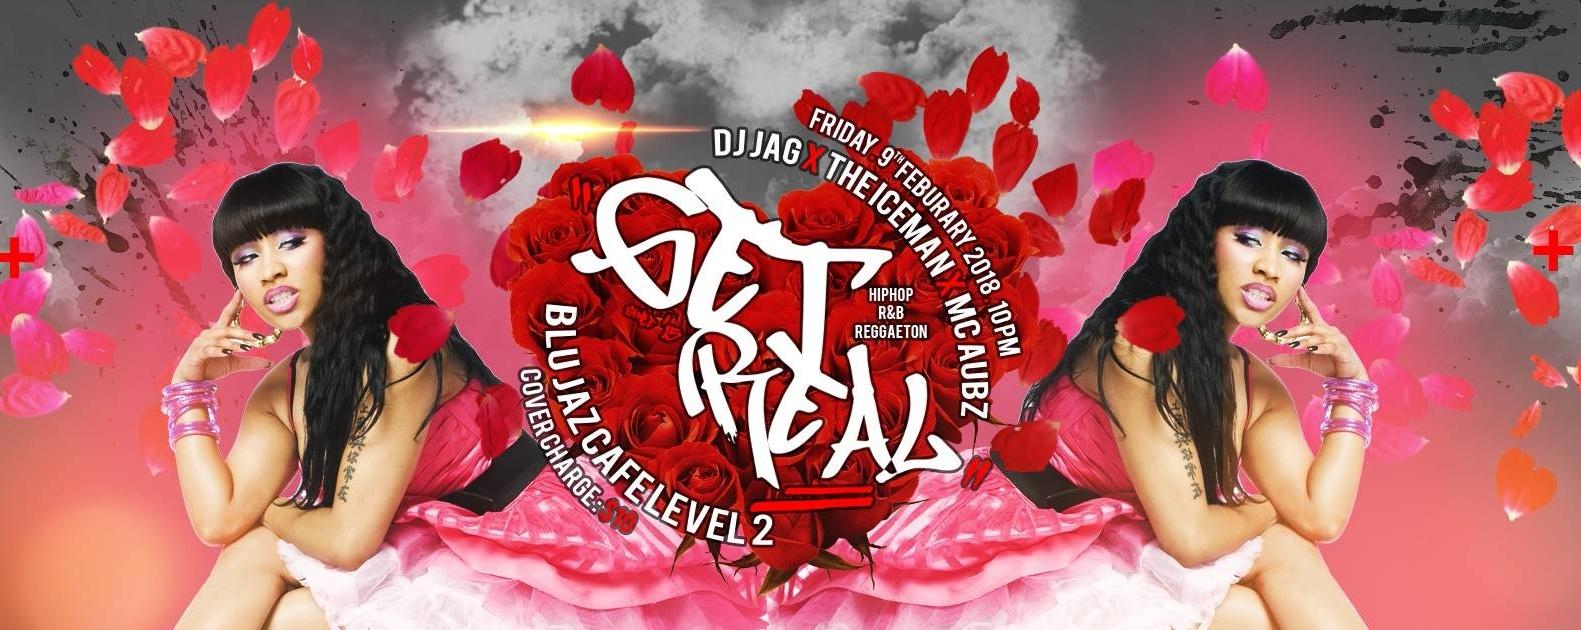 Get Real (2000s Hip Hop x RnB )